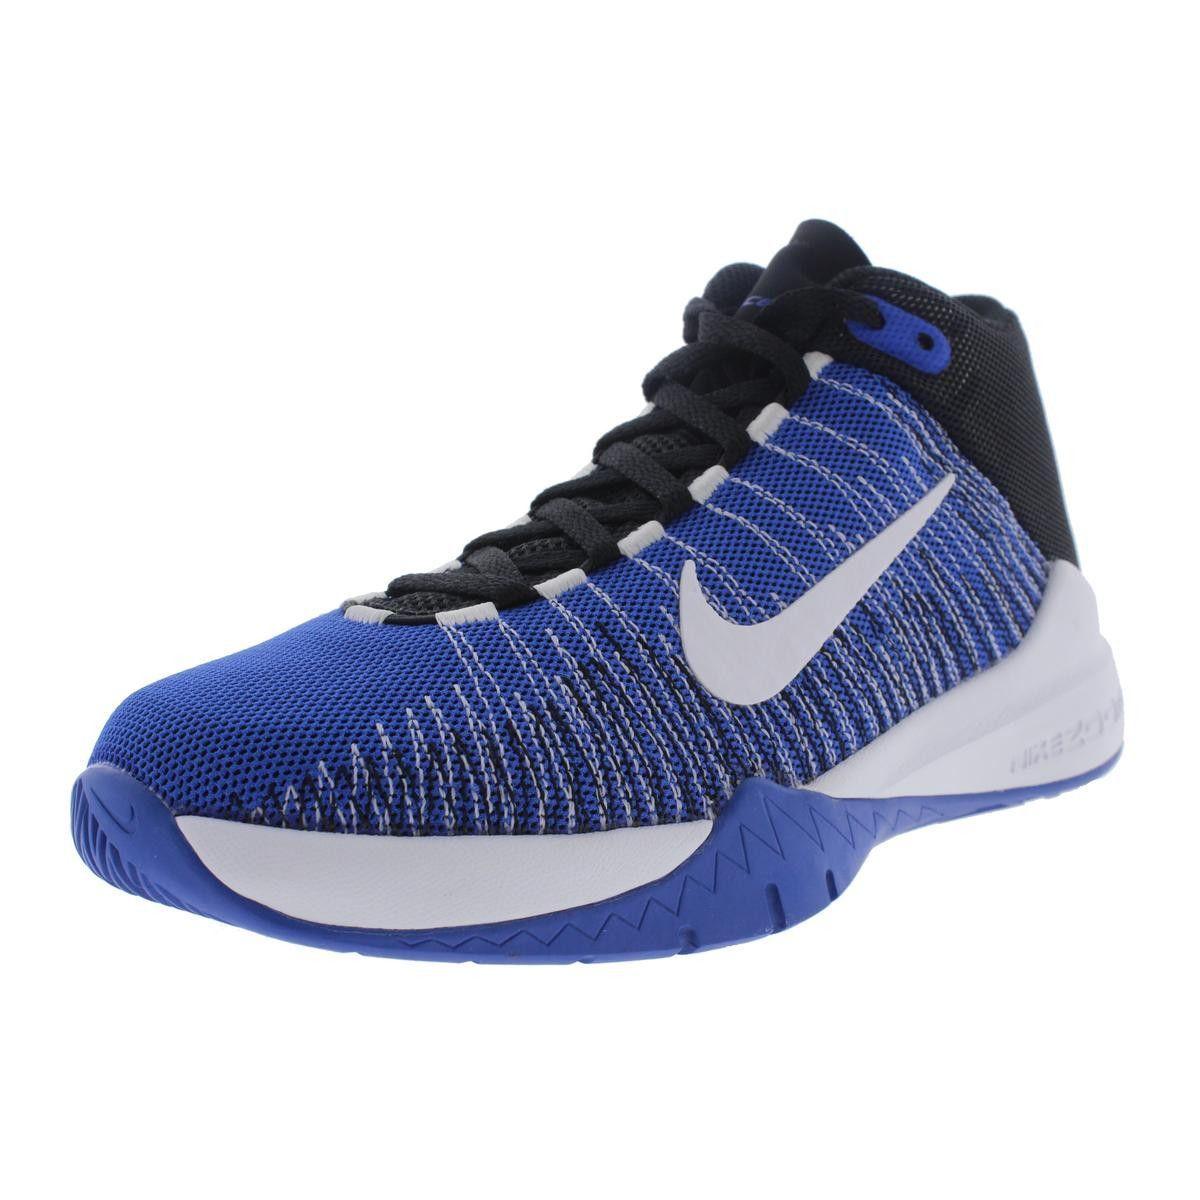 e53a39333231c2 Nike Boys Zoom Ascention Mesh Basketball Shoes